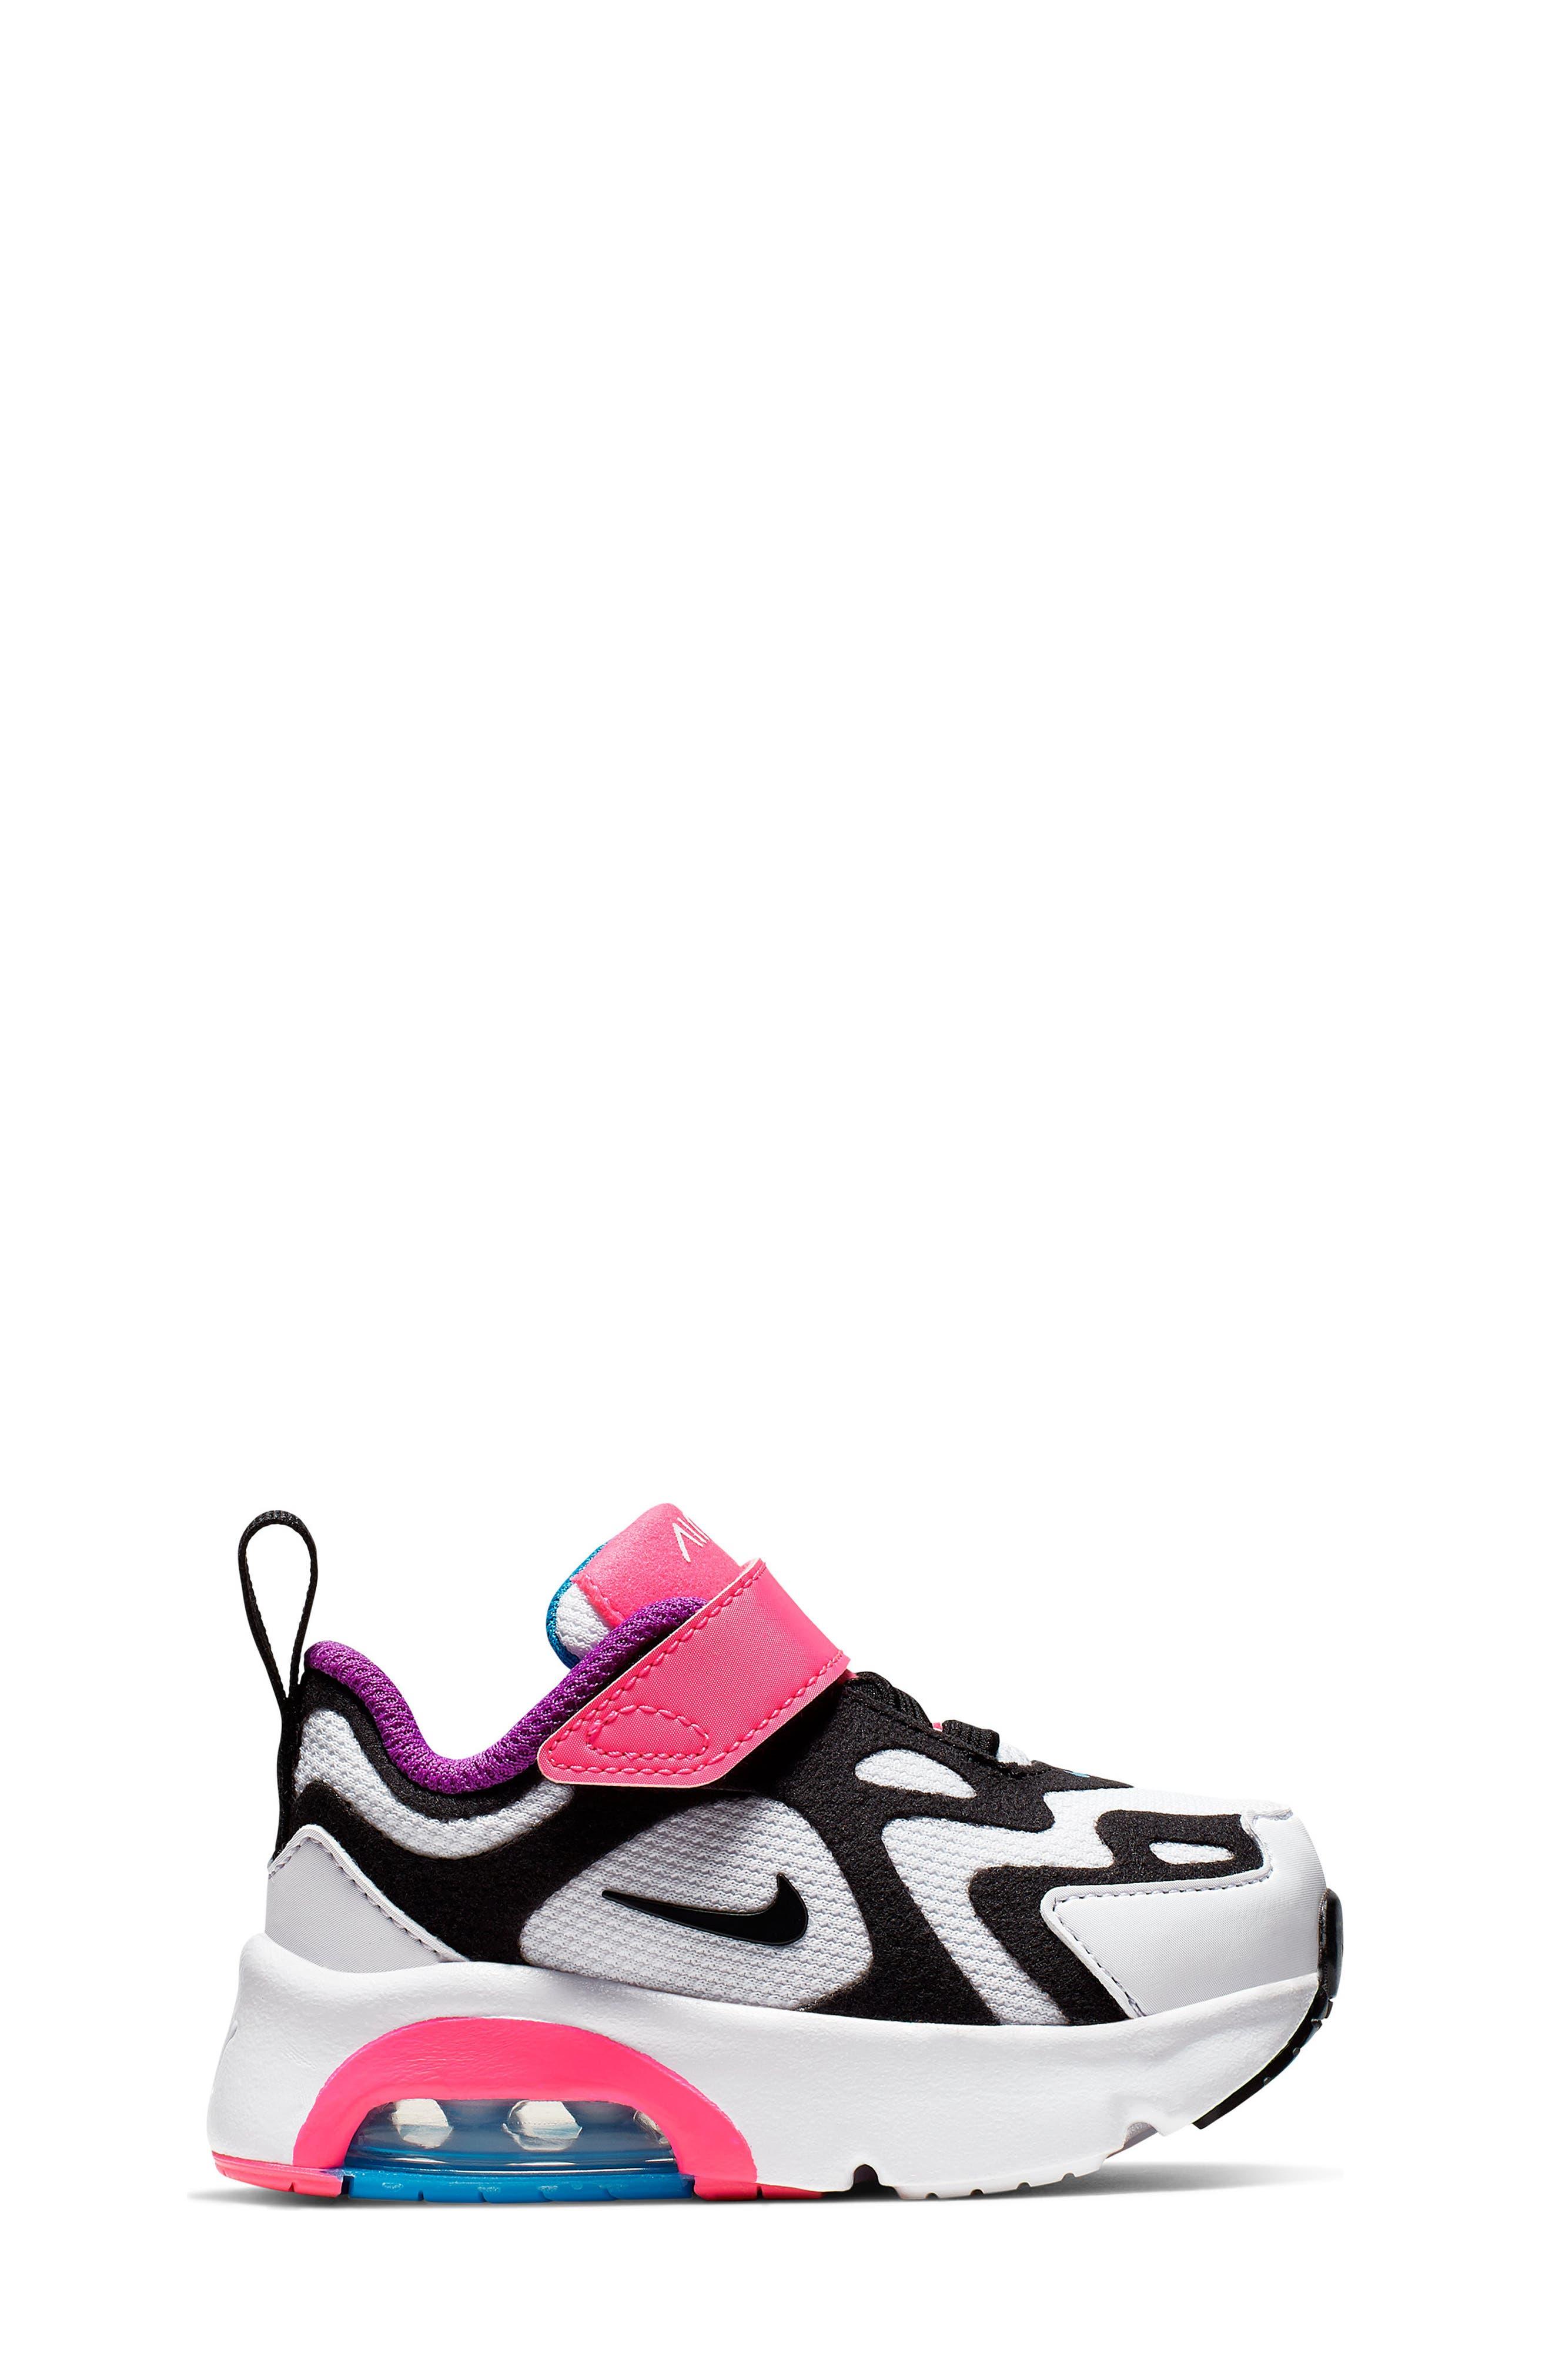 Toddler Boys Nike Air Max 200 Sneaker Td Size 7 M  White